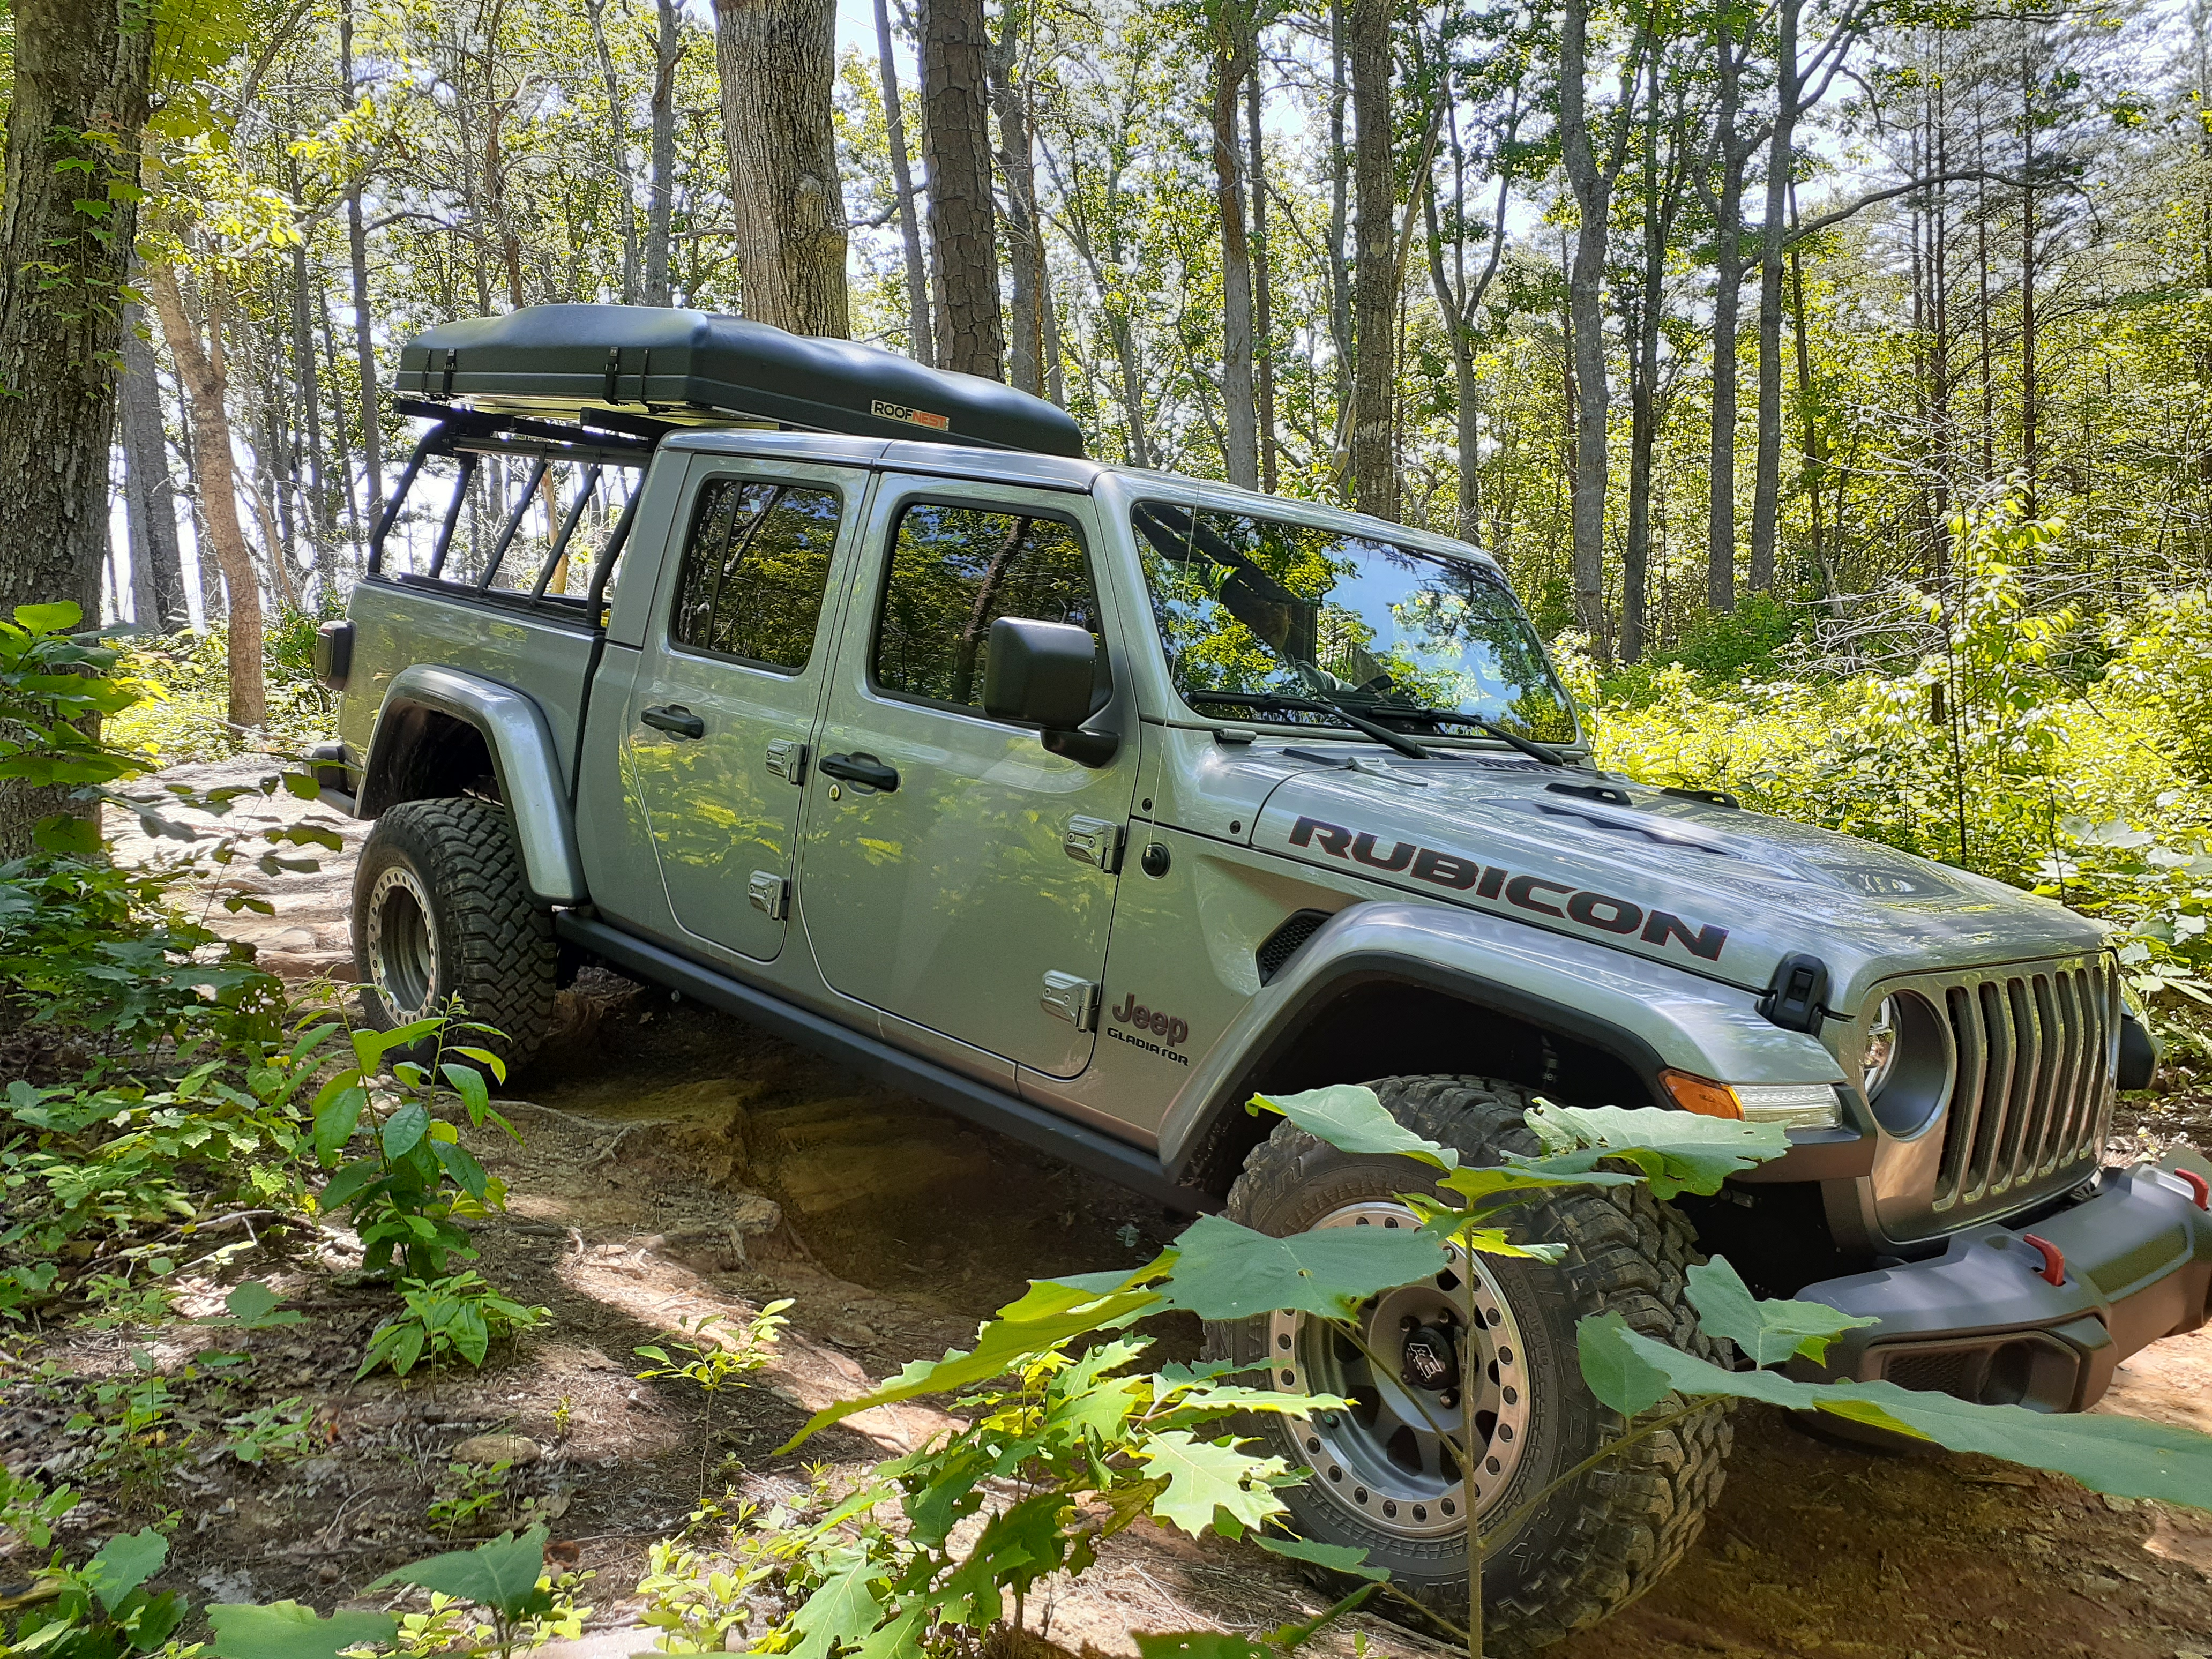 gladiator en route to adventure.. Jeep Gladiator Rubicon with Condor XL RTT 2020